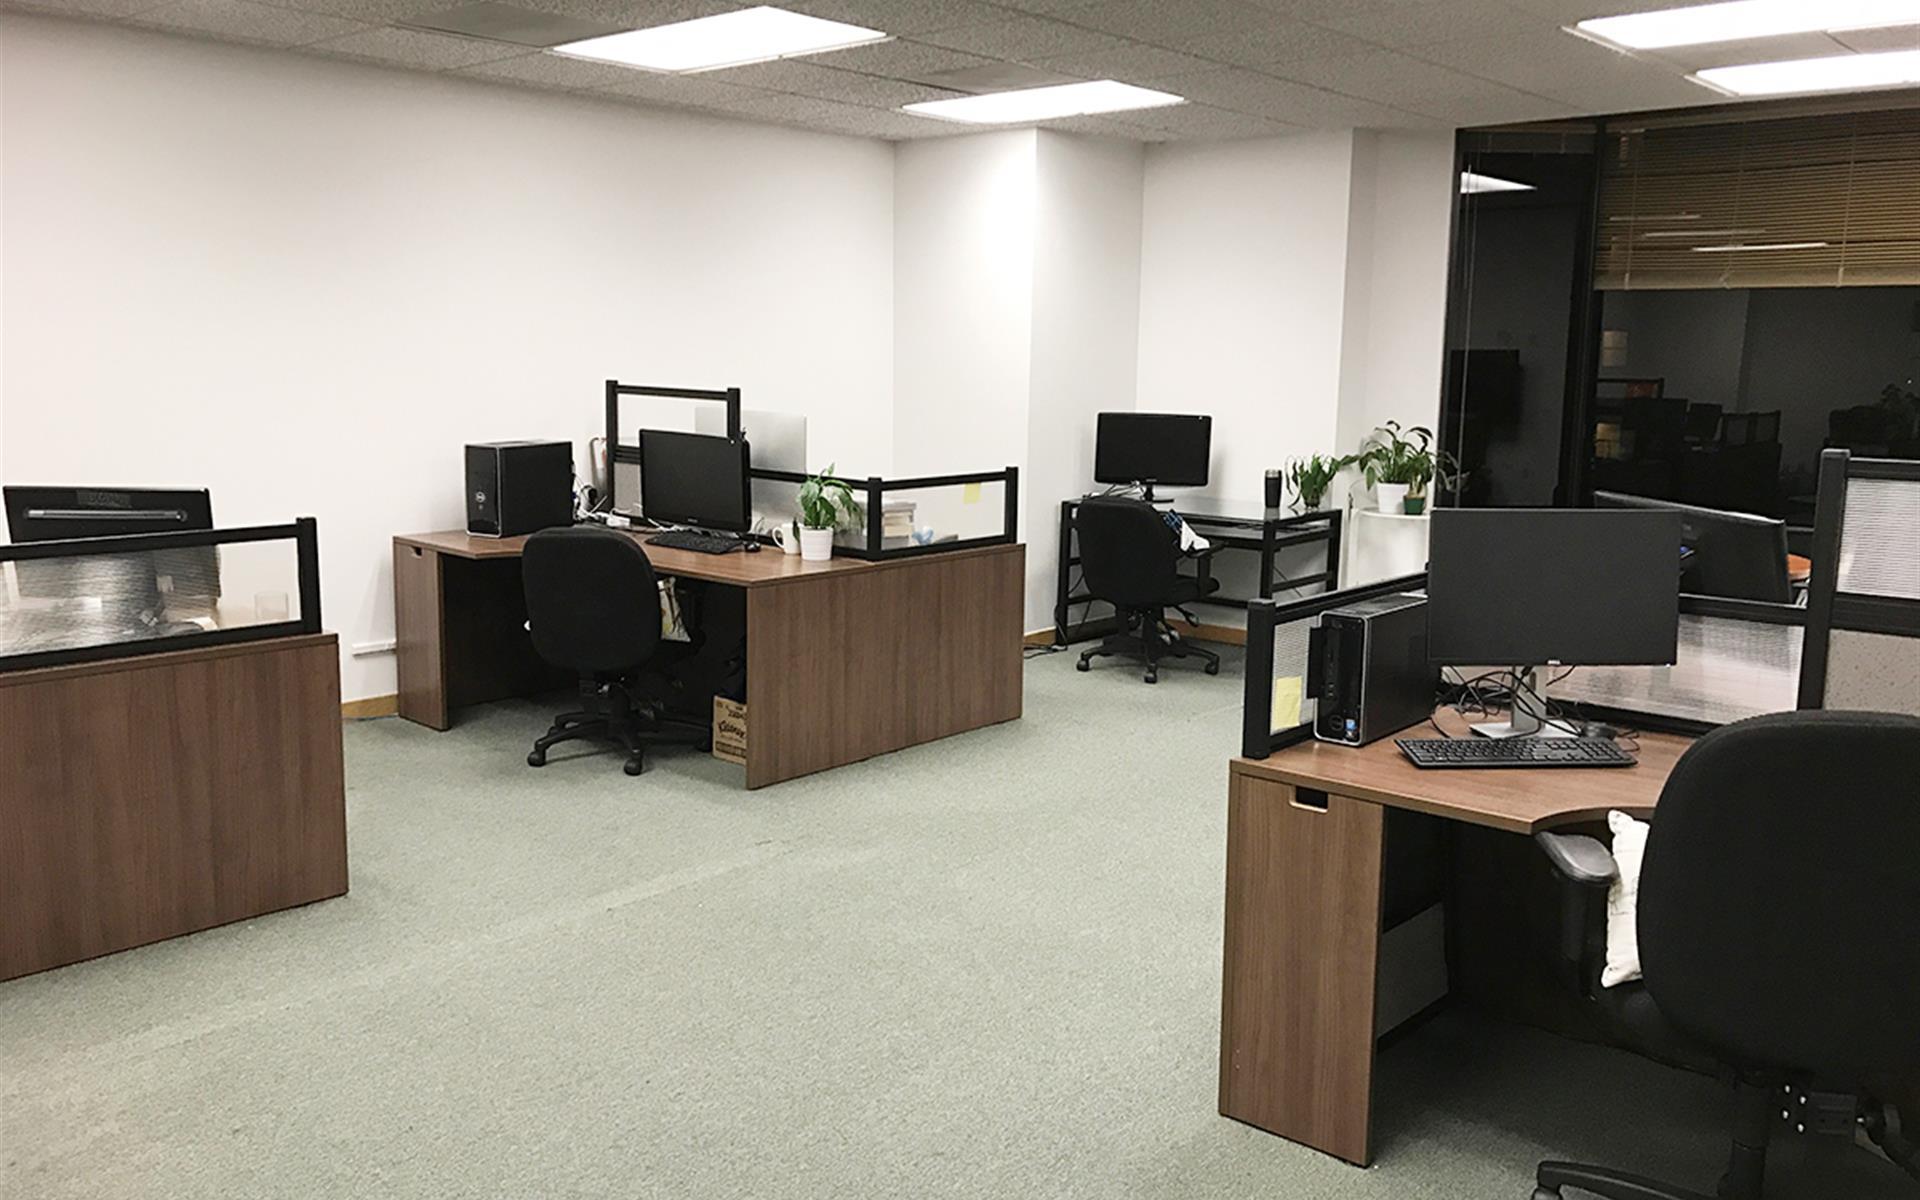 YIBADA - Large open space